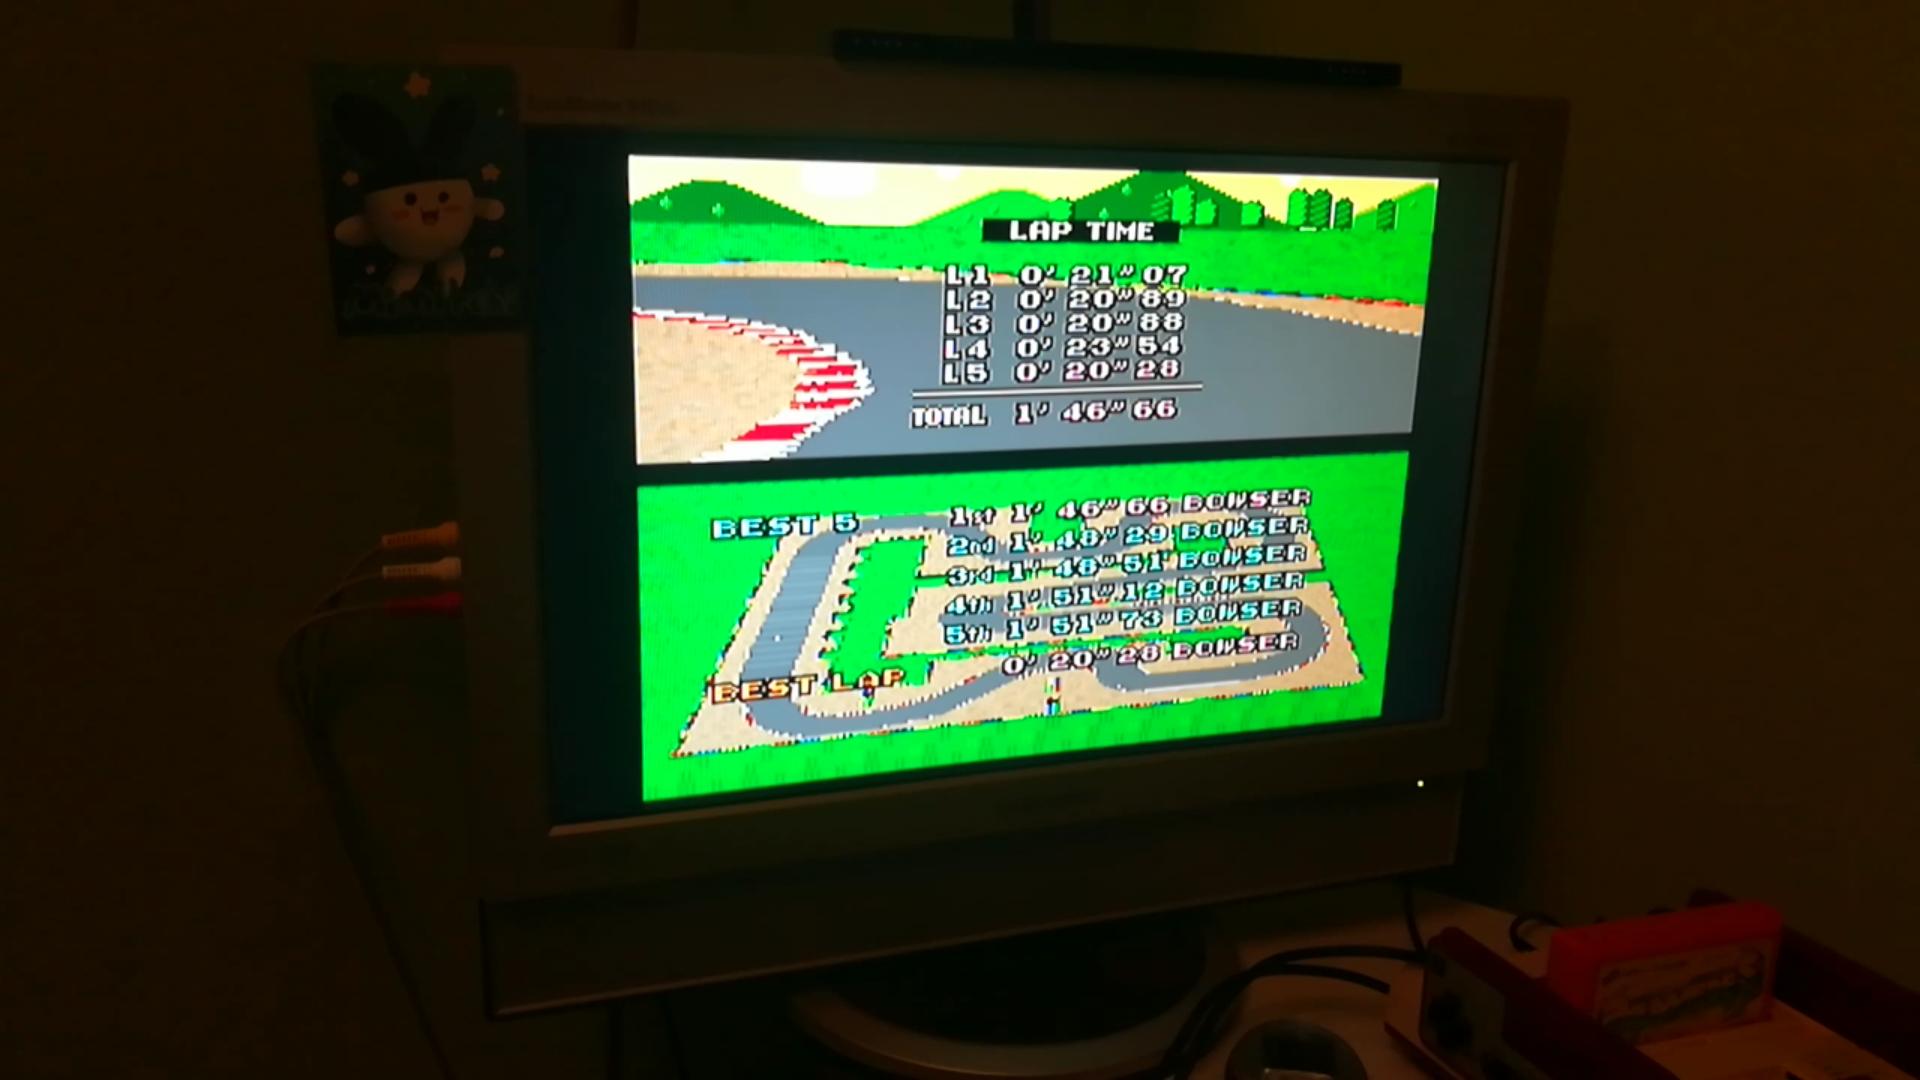 Mimitchi: Super Mario Kart: Mario Circuit 3 [Time Trial] (SNES/Super Famicom Emulated) 0:01:46.66 points on 2020-03-09 21:32:53